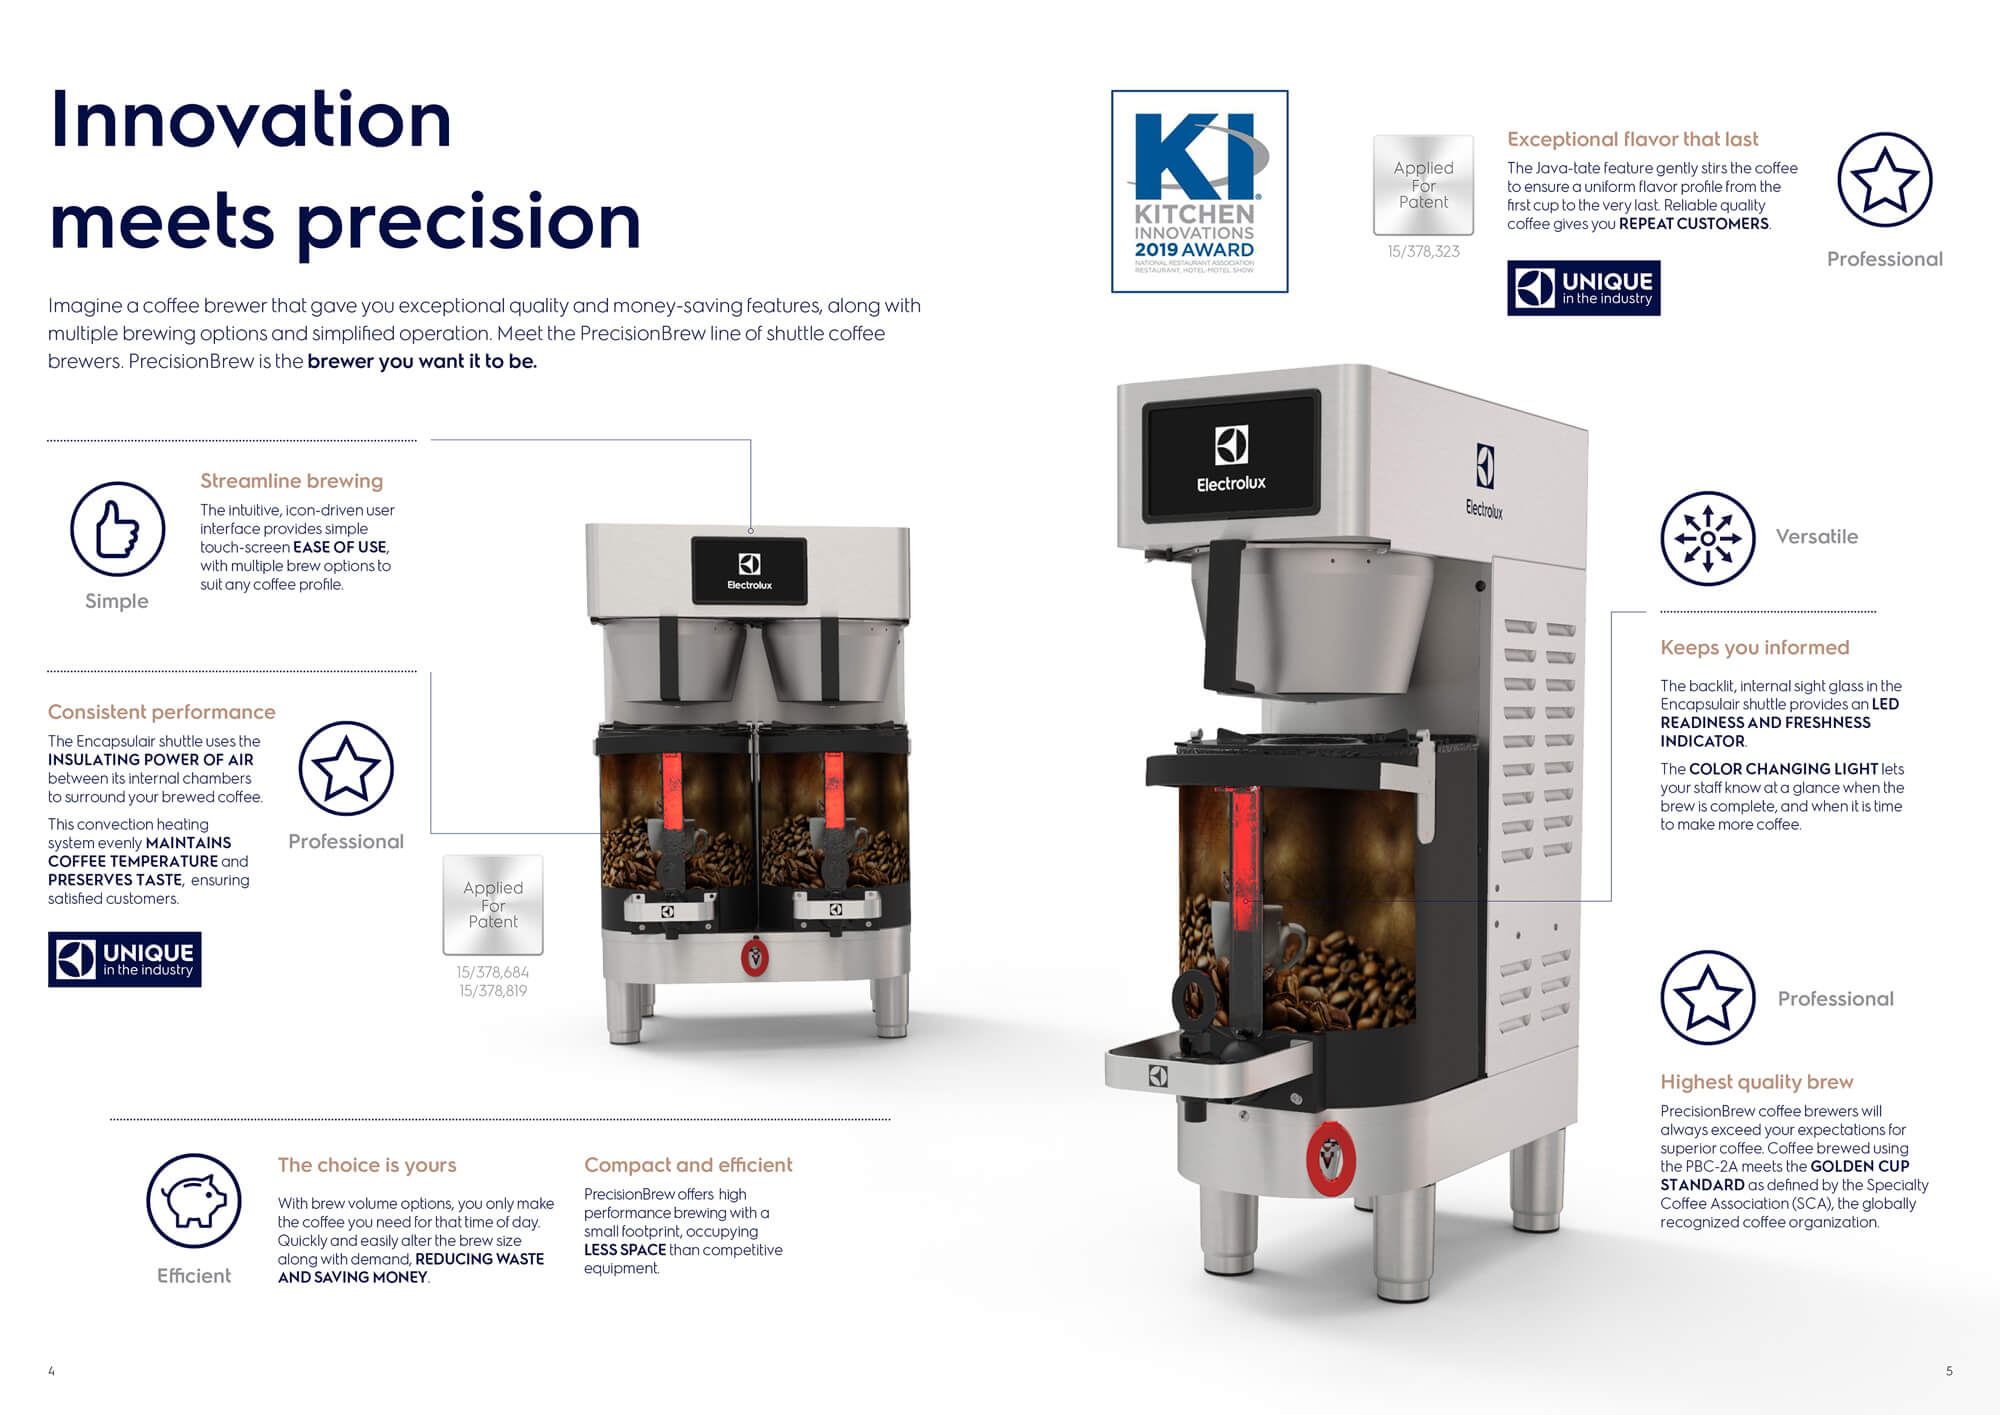 Electrolux PrecisionBrew Brochure